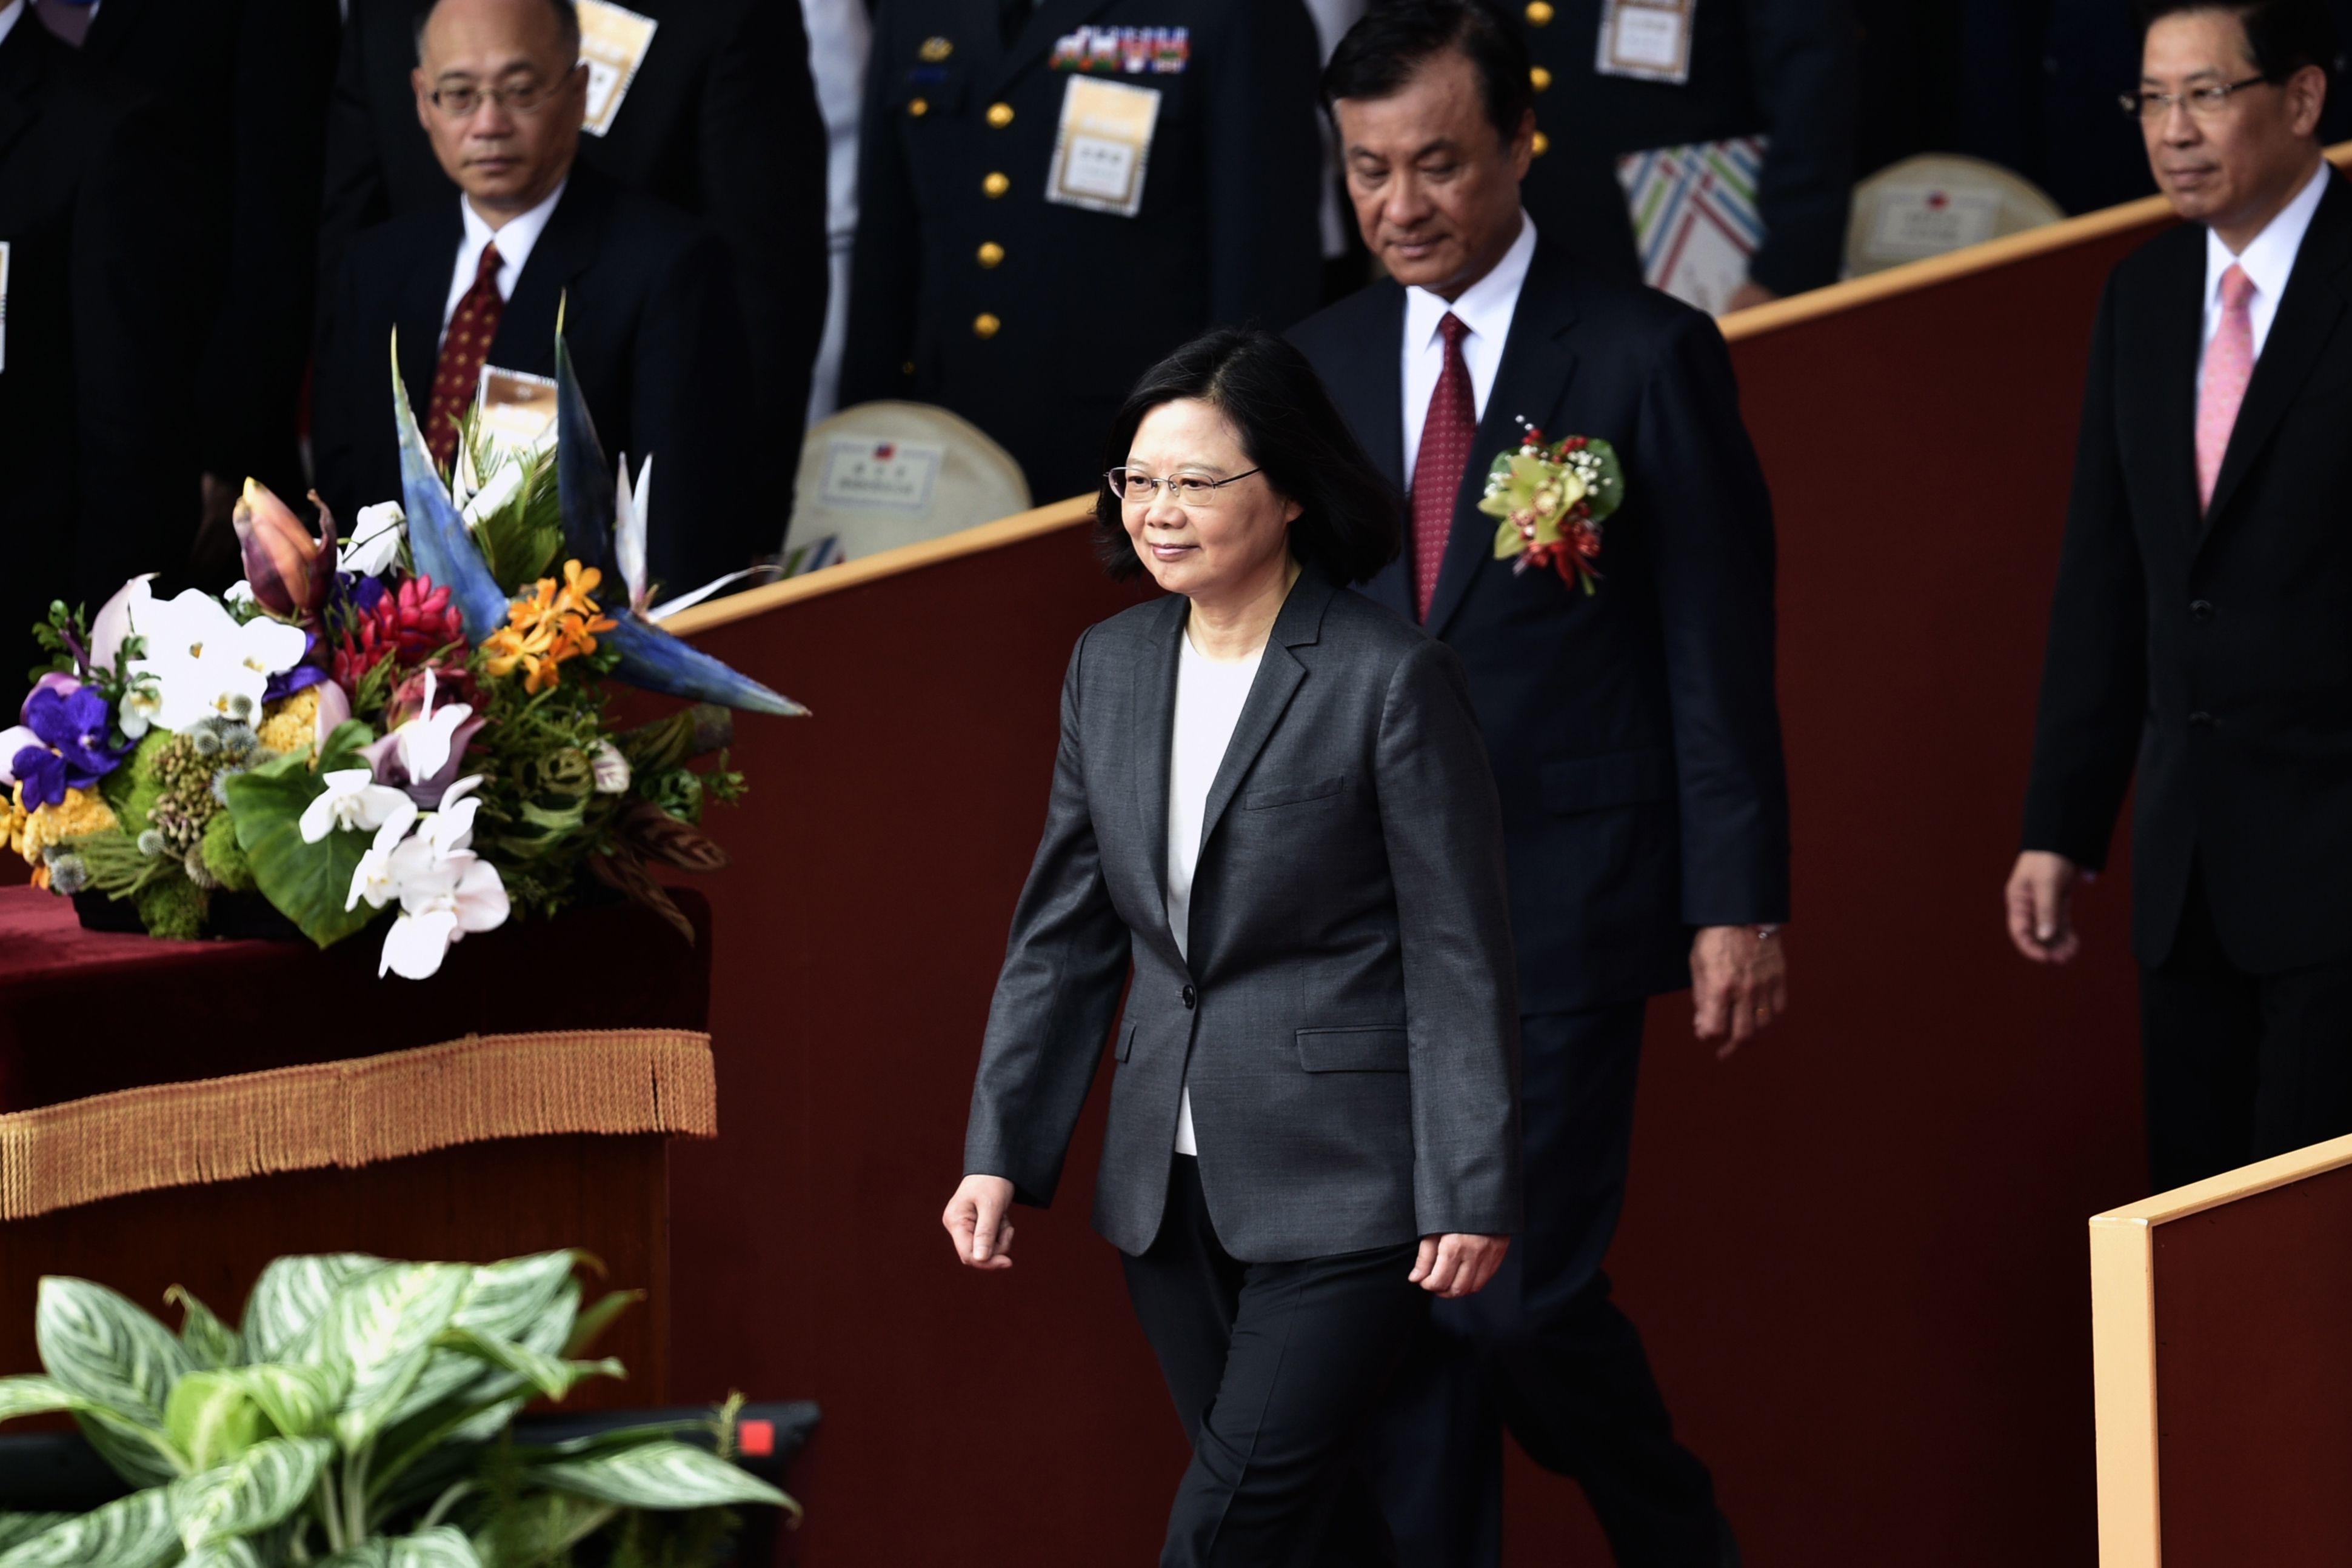 وصول رئيسة تايوان